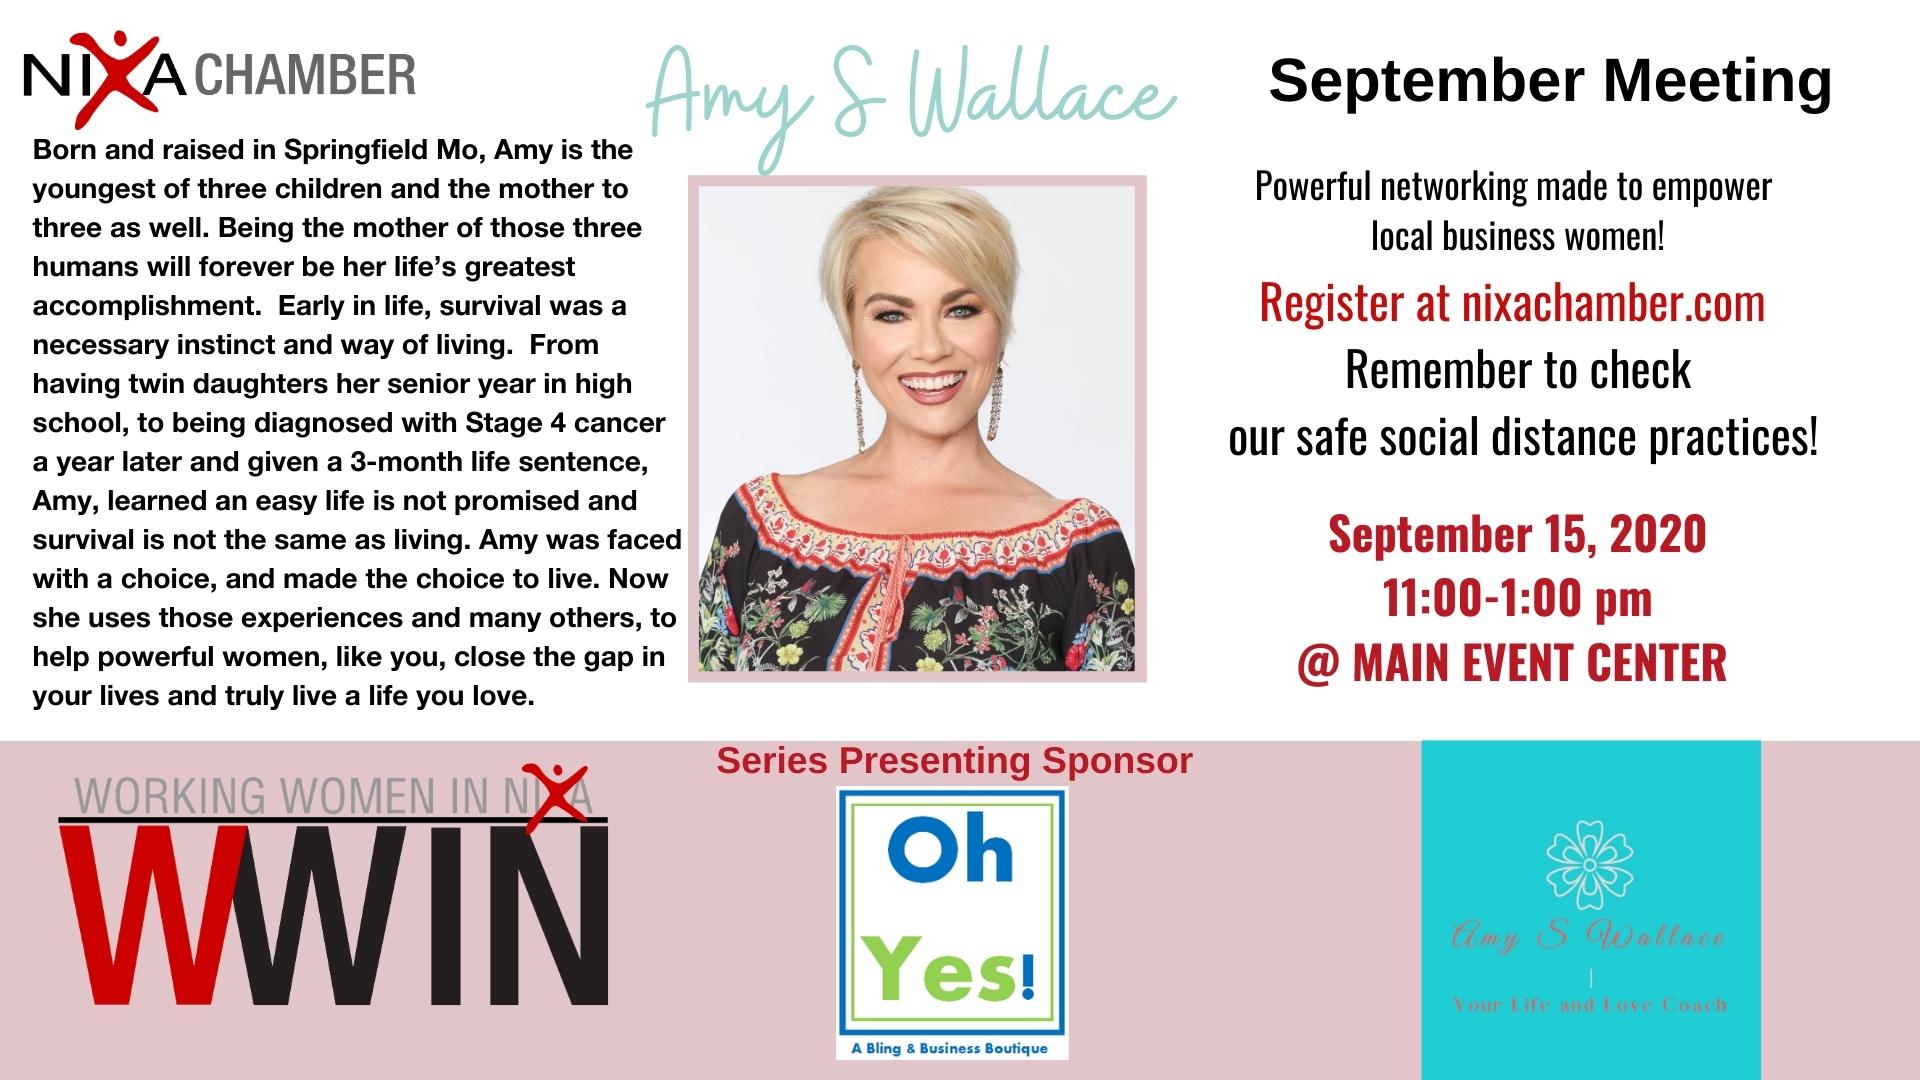 Amy Wallace